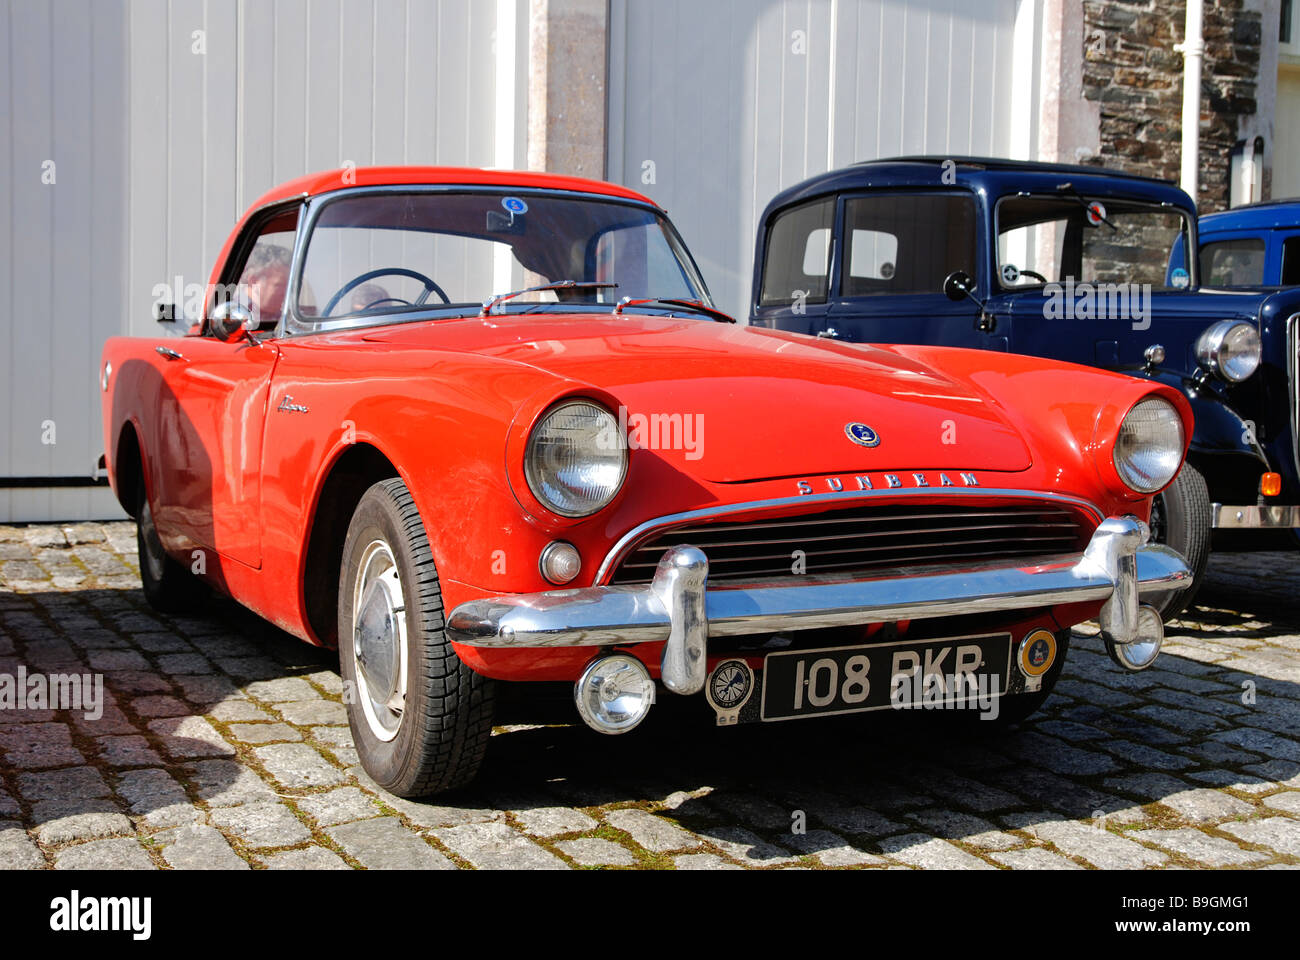 an old sunbeam alpine motor car, uk - Stock Image